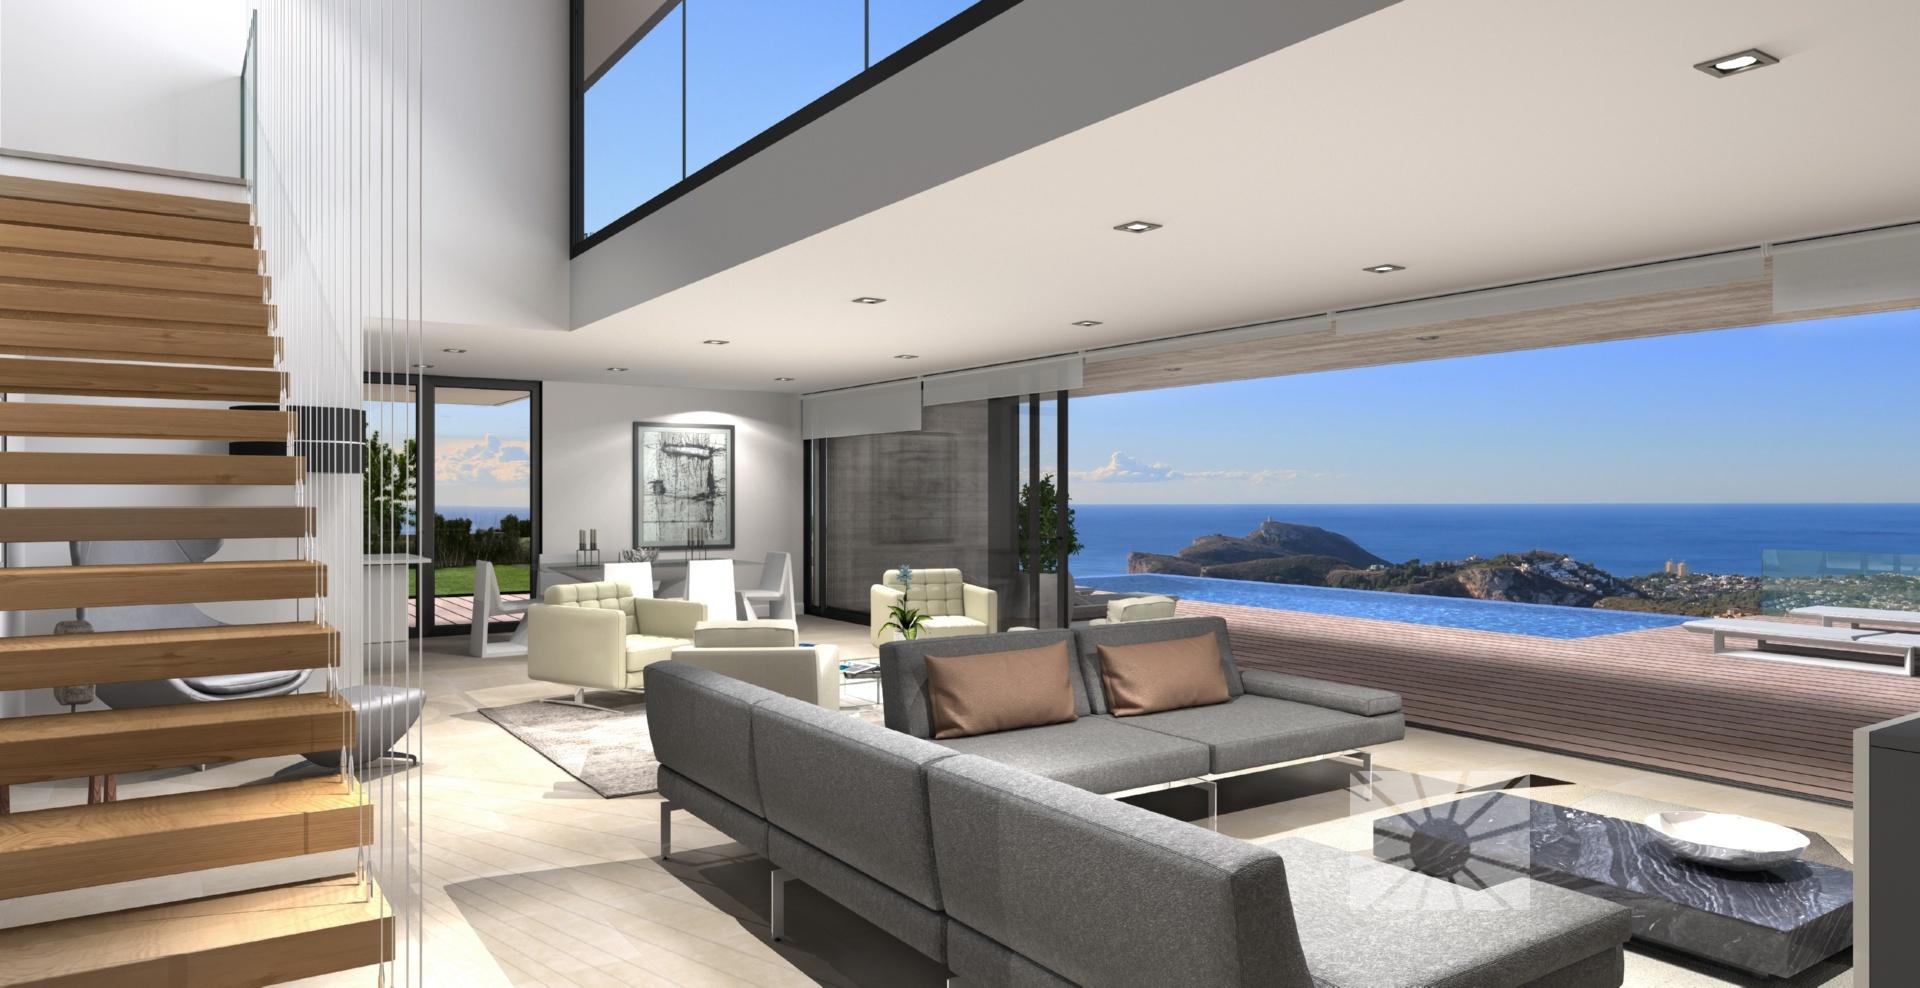 Luxe moderne zeezicht villa in benitachell spanje specials for Moderne luxe villa